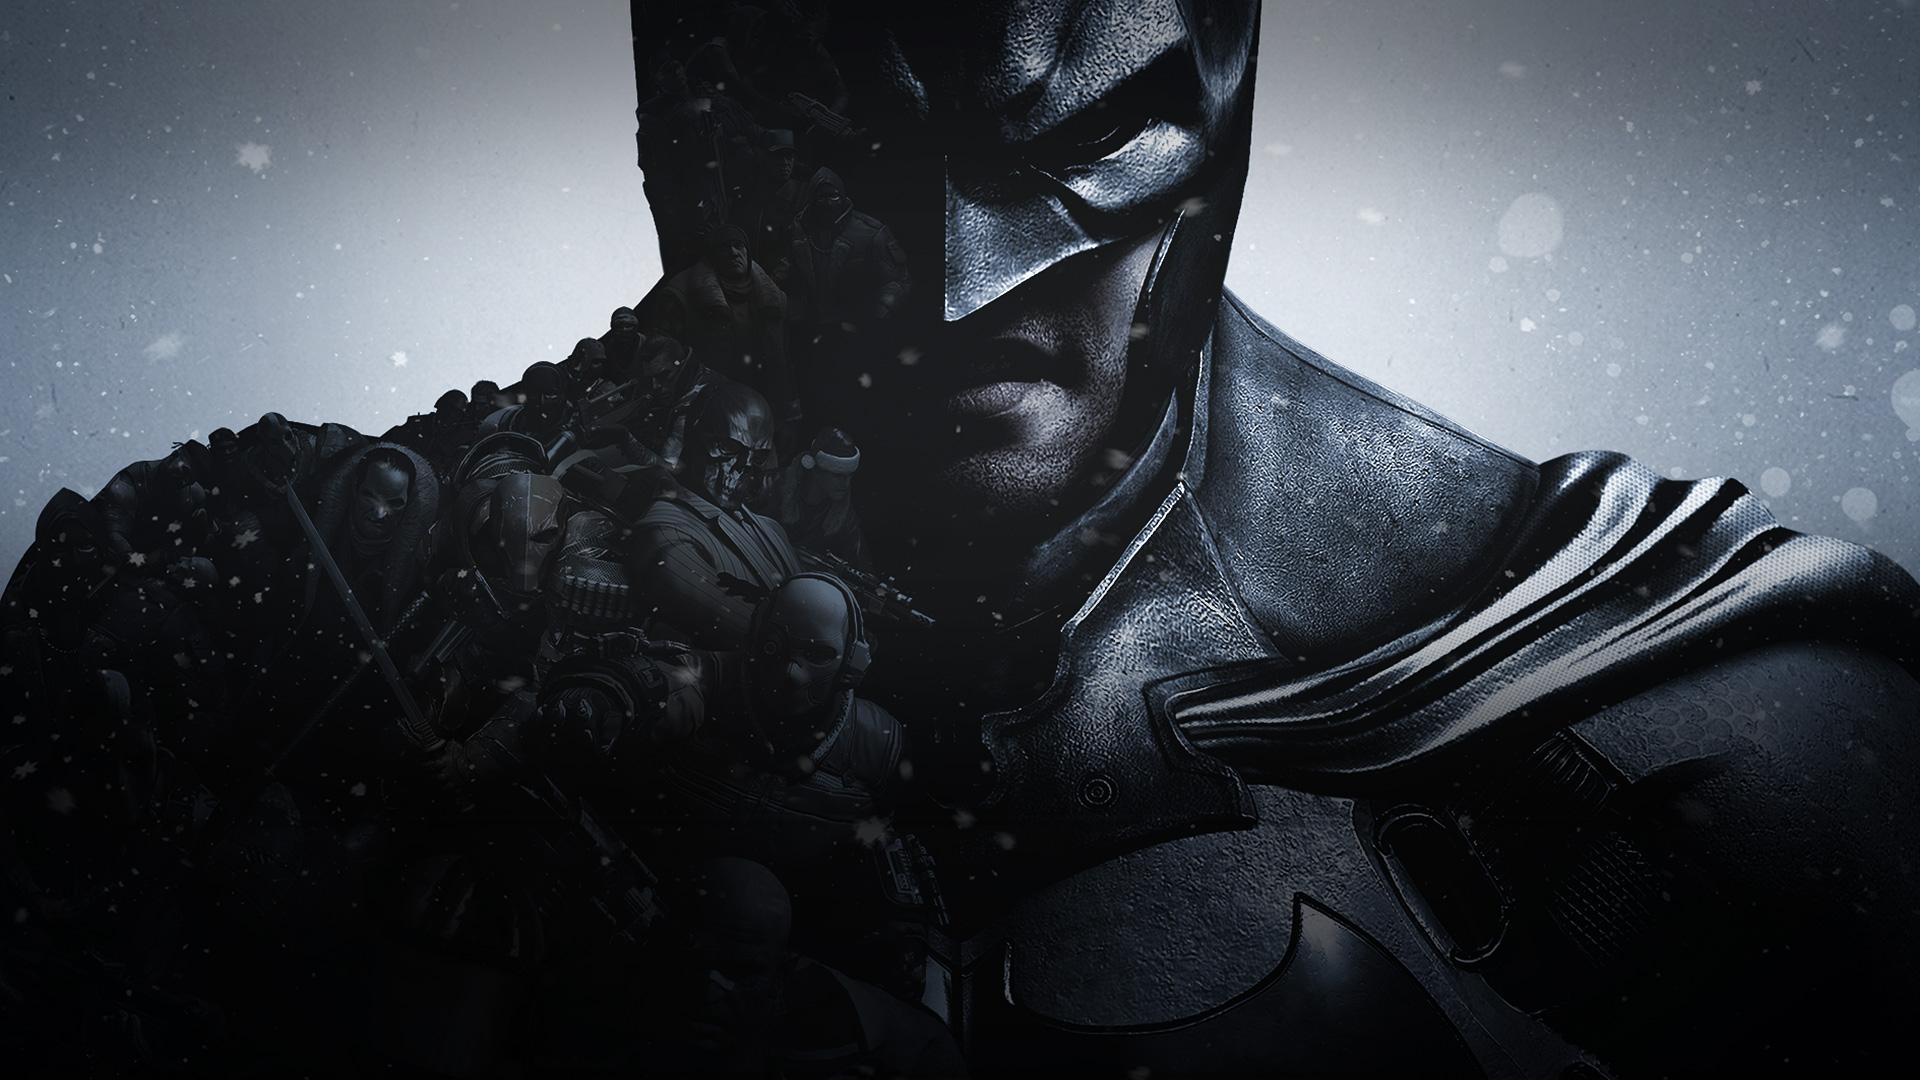 Batman: Arkham Origins Full HD Fond d'écran and Arrière-Plan | 1920x1080 | ID:420099